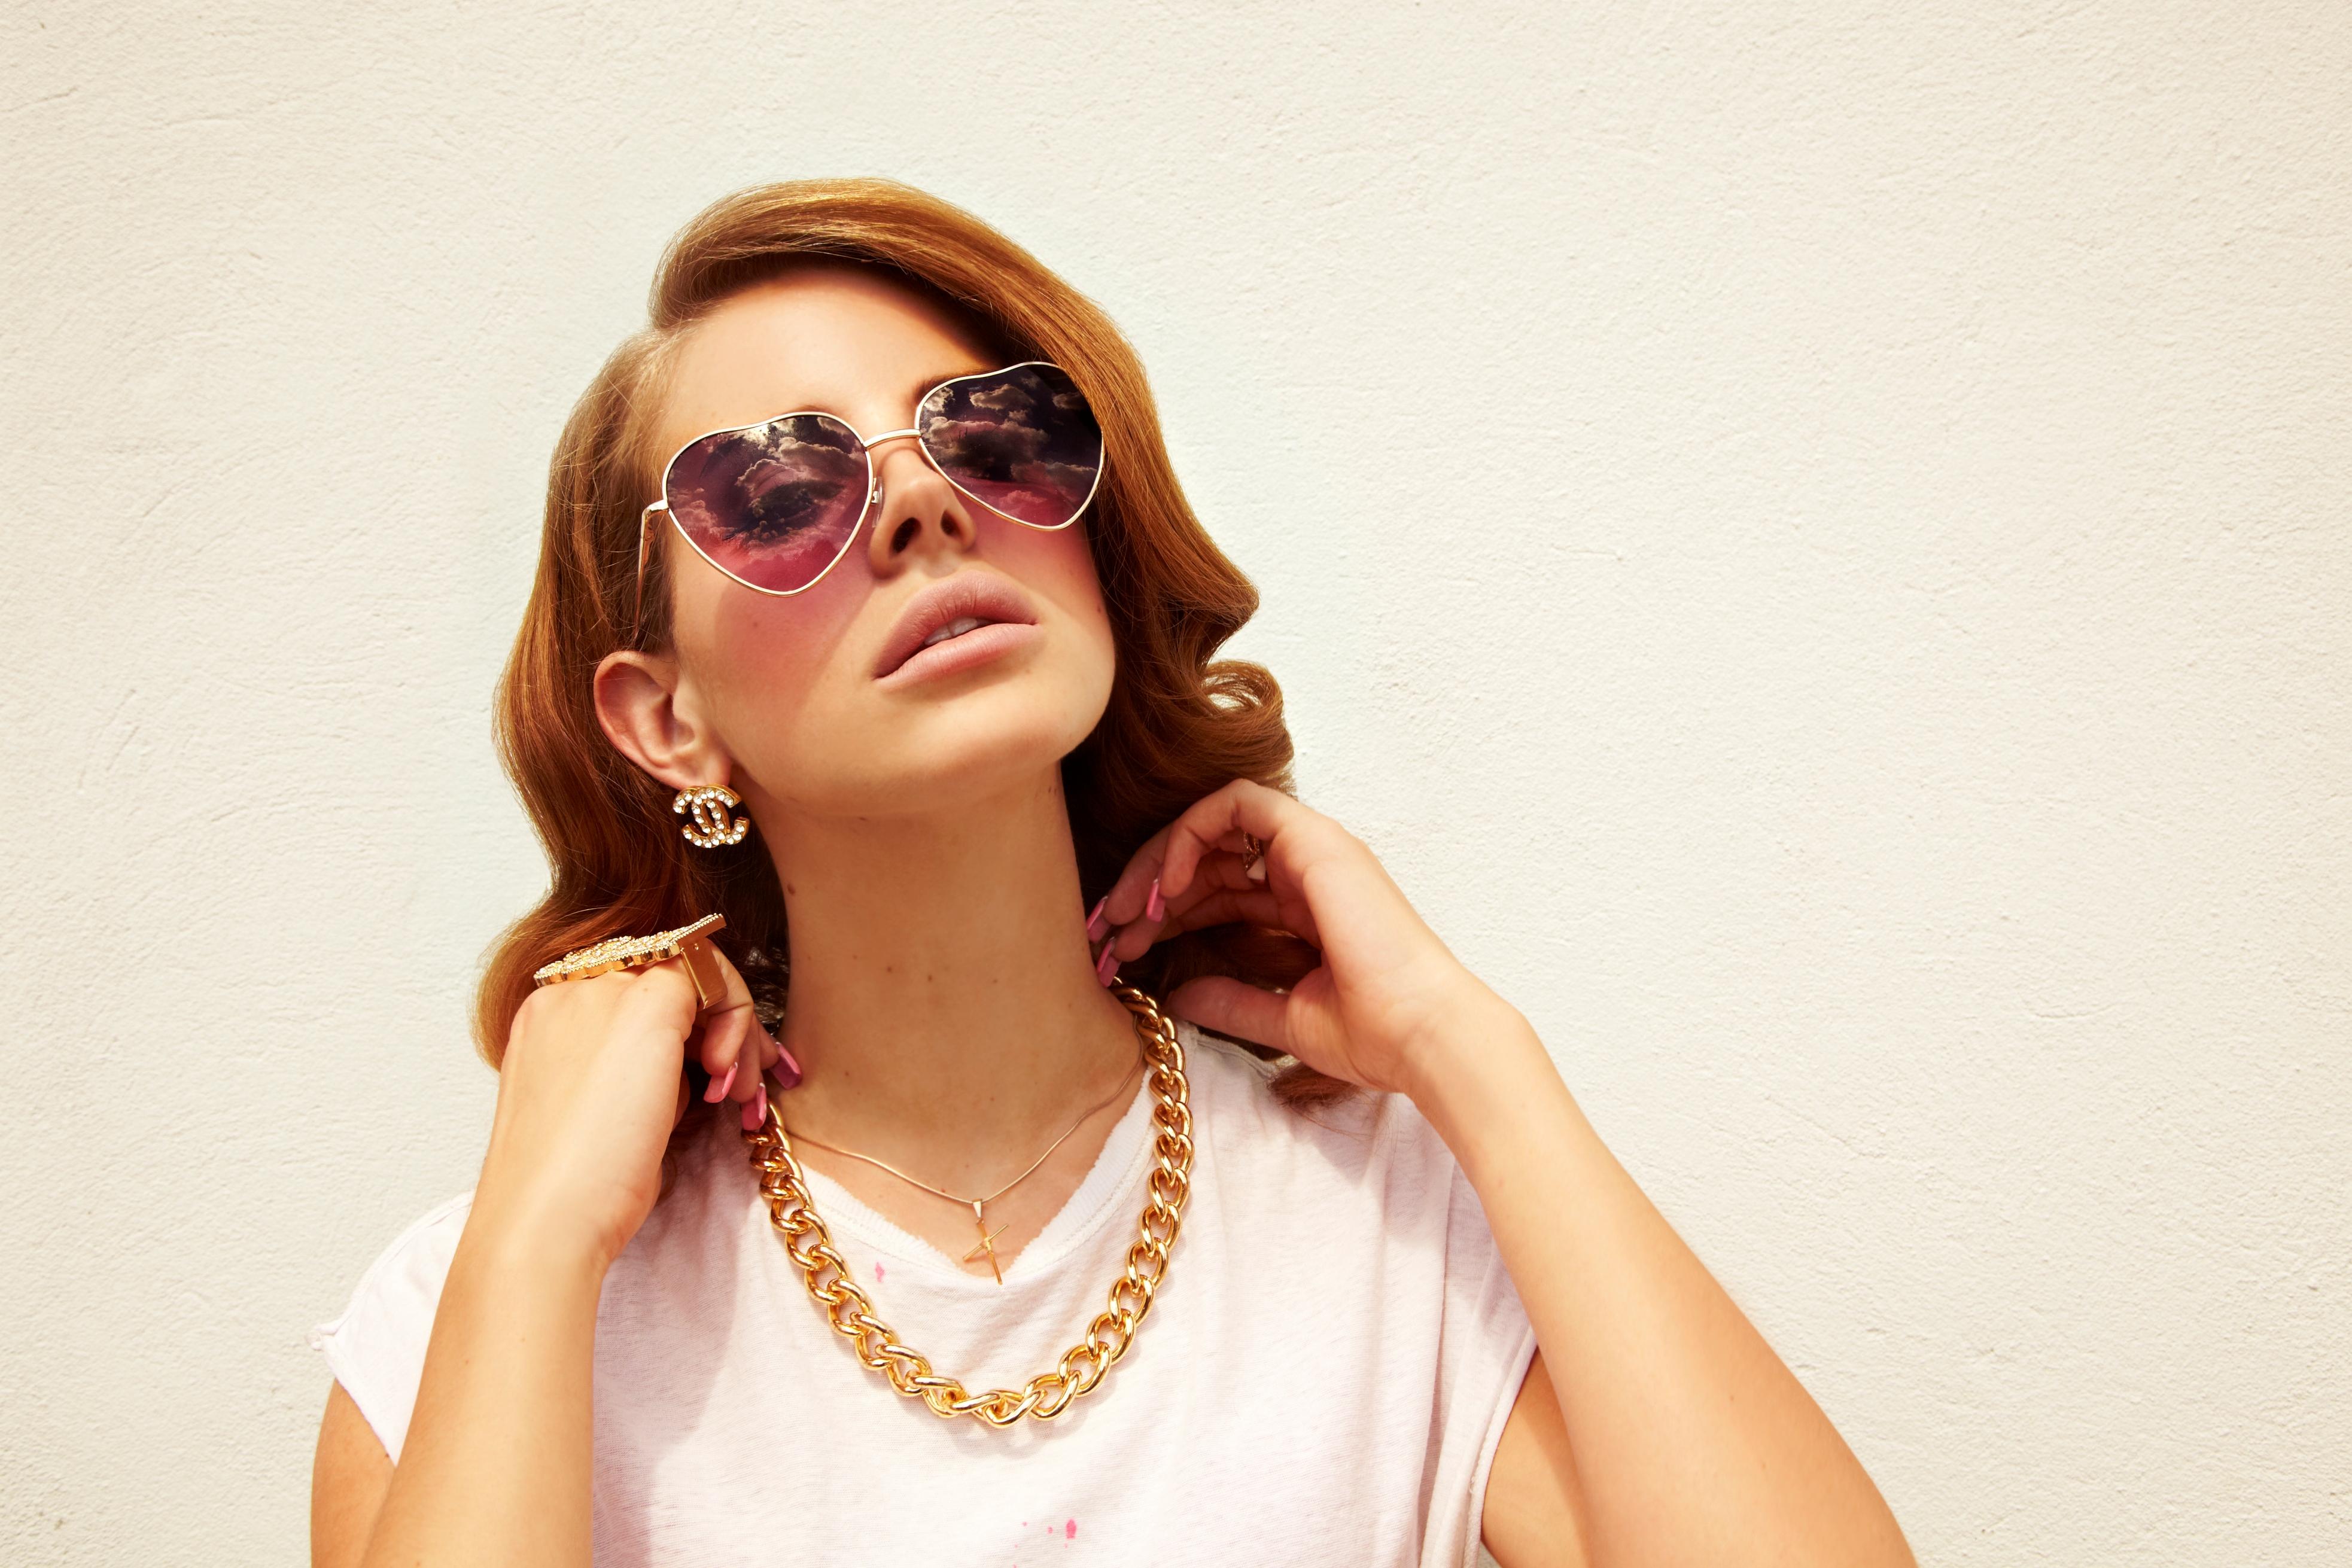 Lana Del Rey Backgrounds, Compatible - PC, Mobile, Gadgets| 3931x2621 px